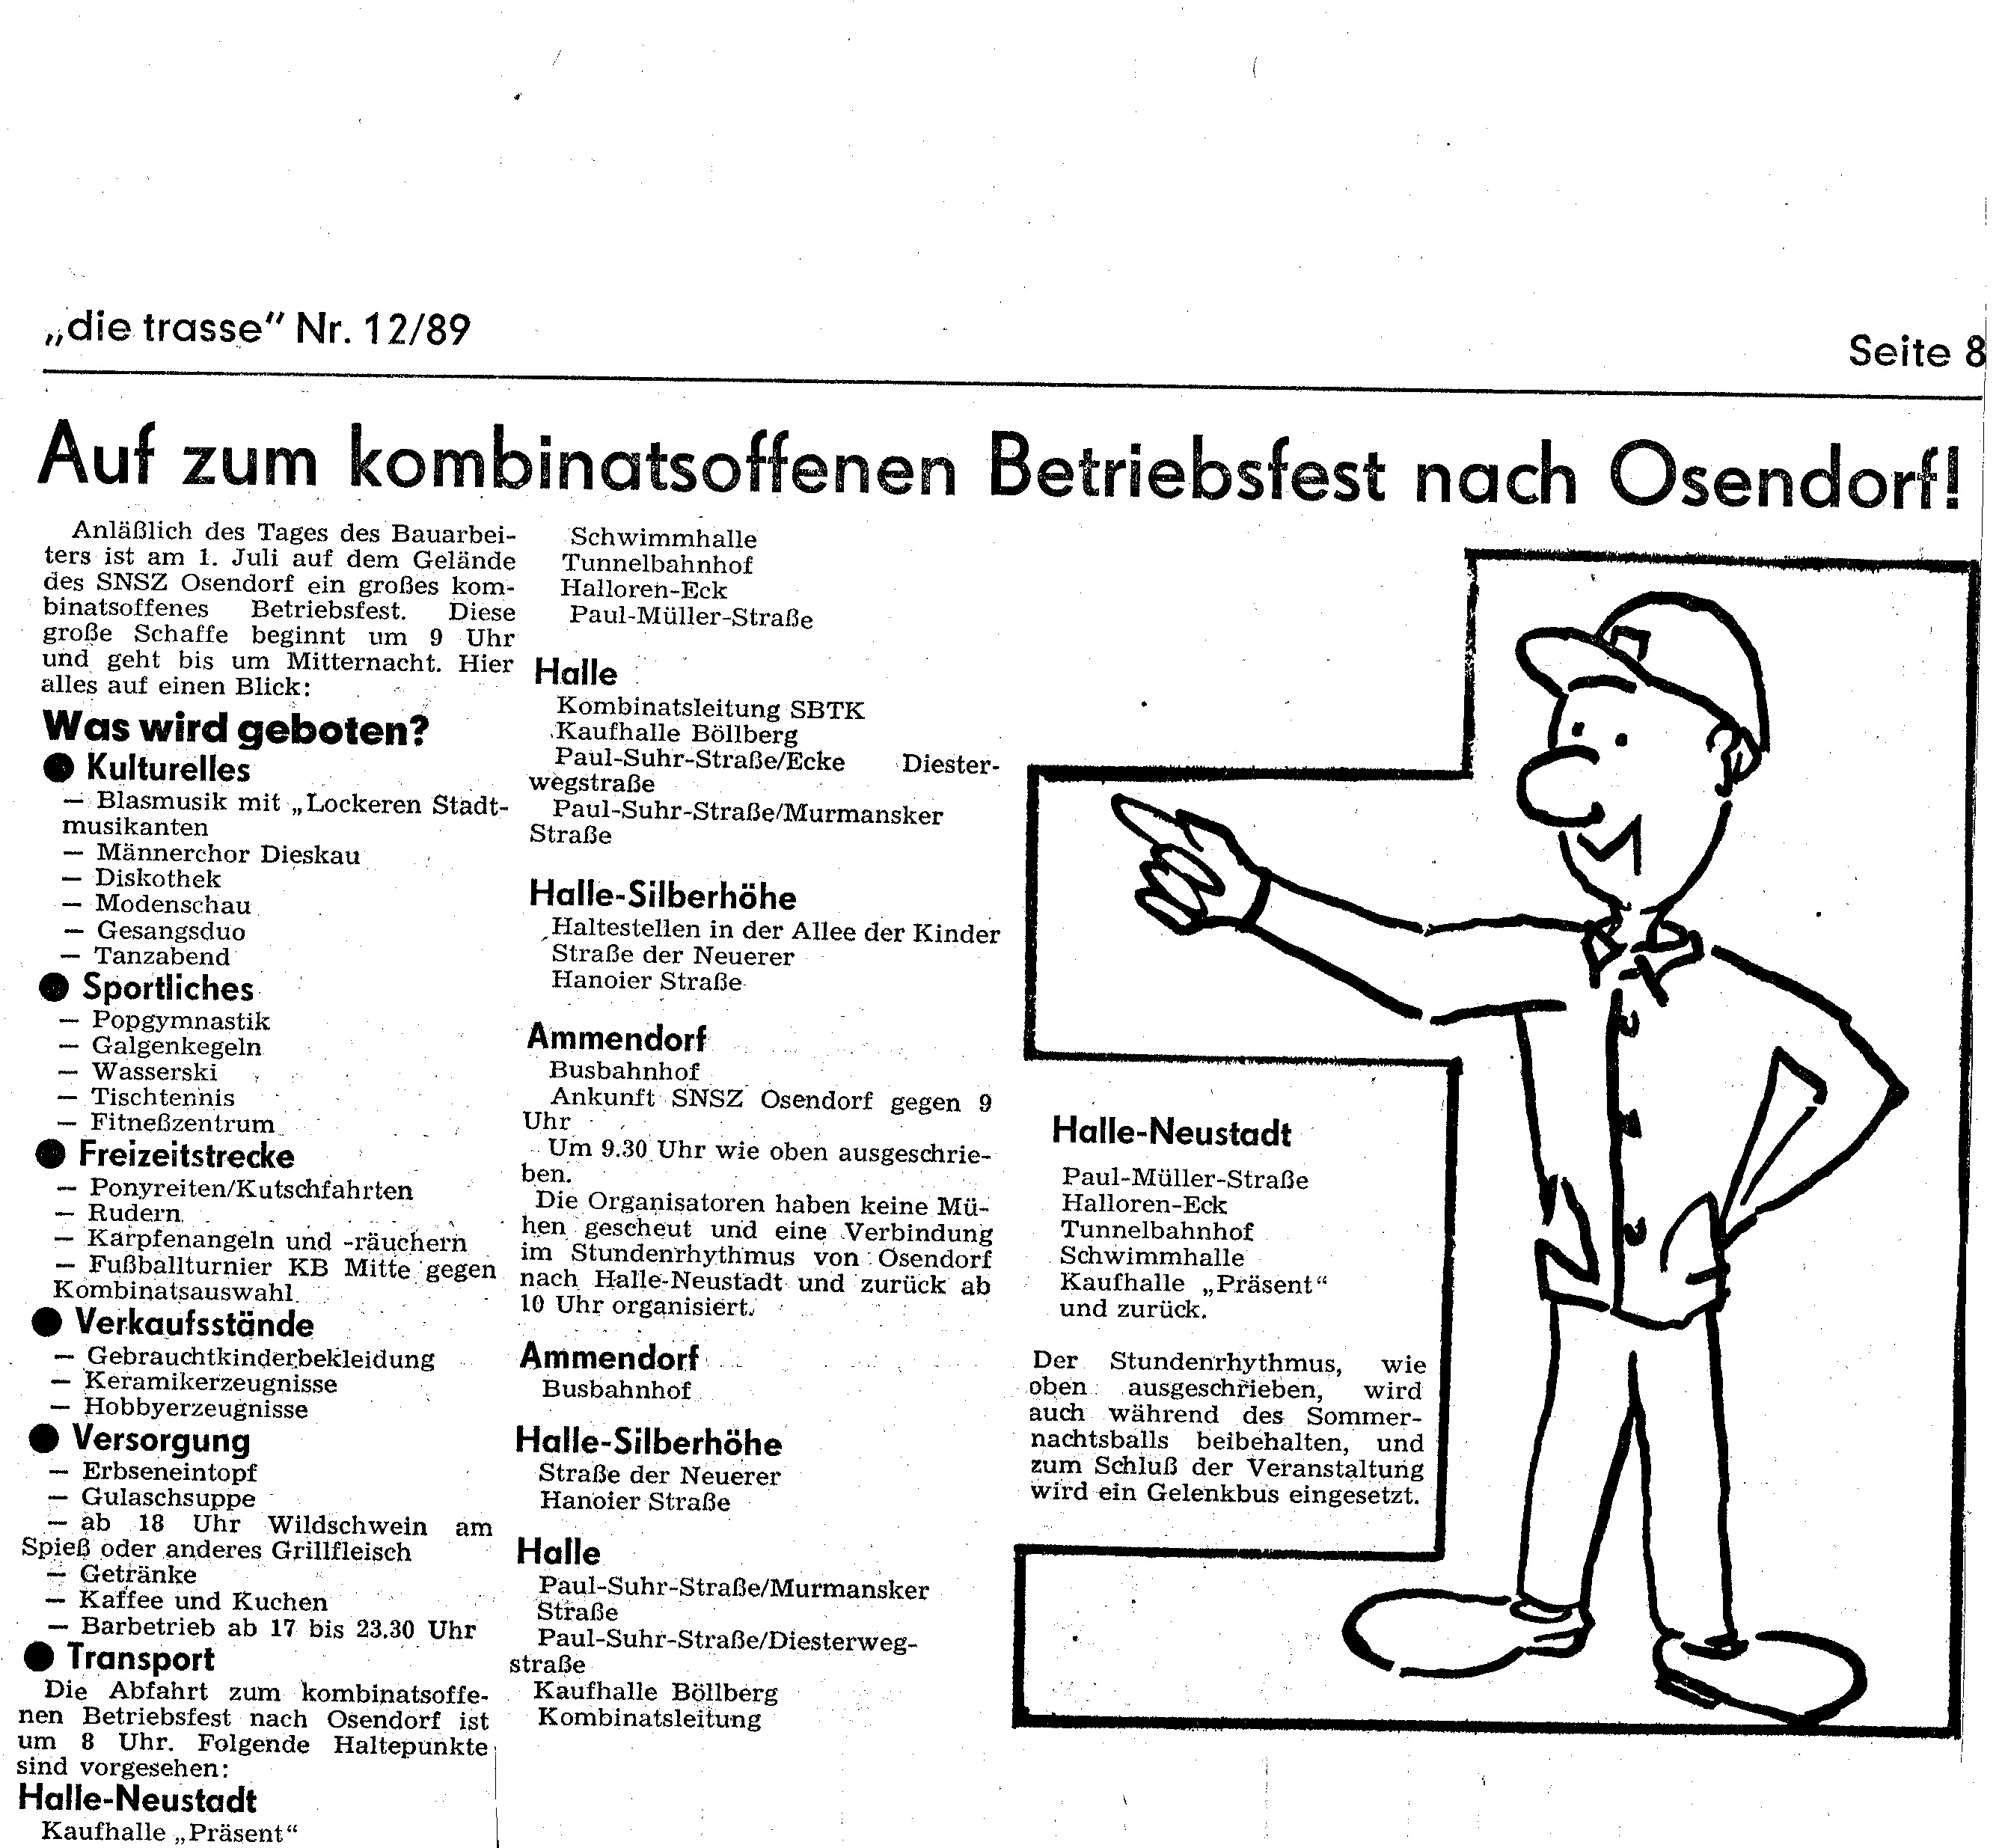 1989 Betriebsfest Osendorf